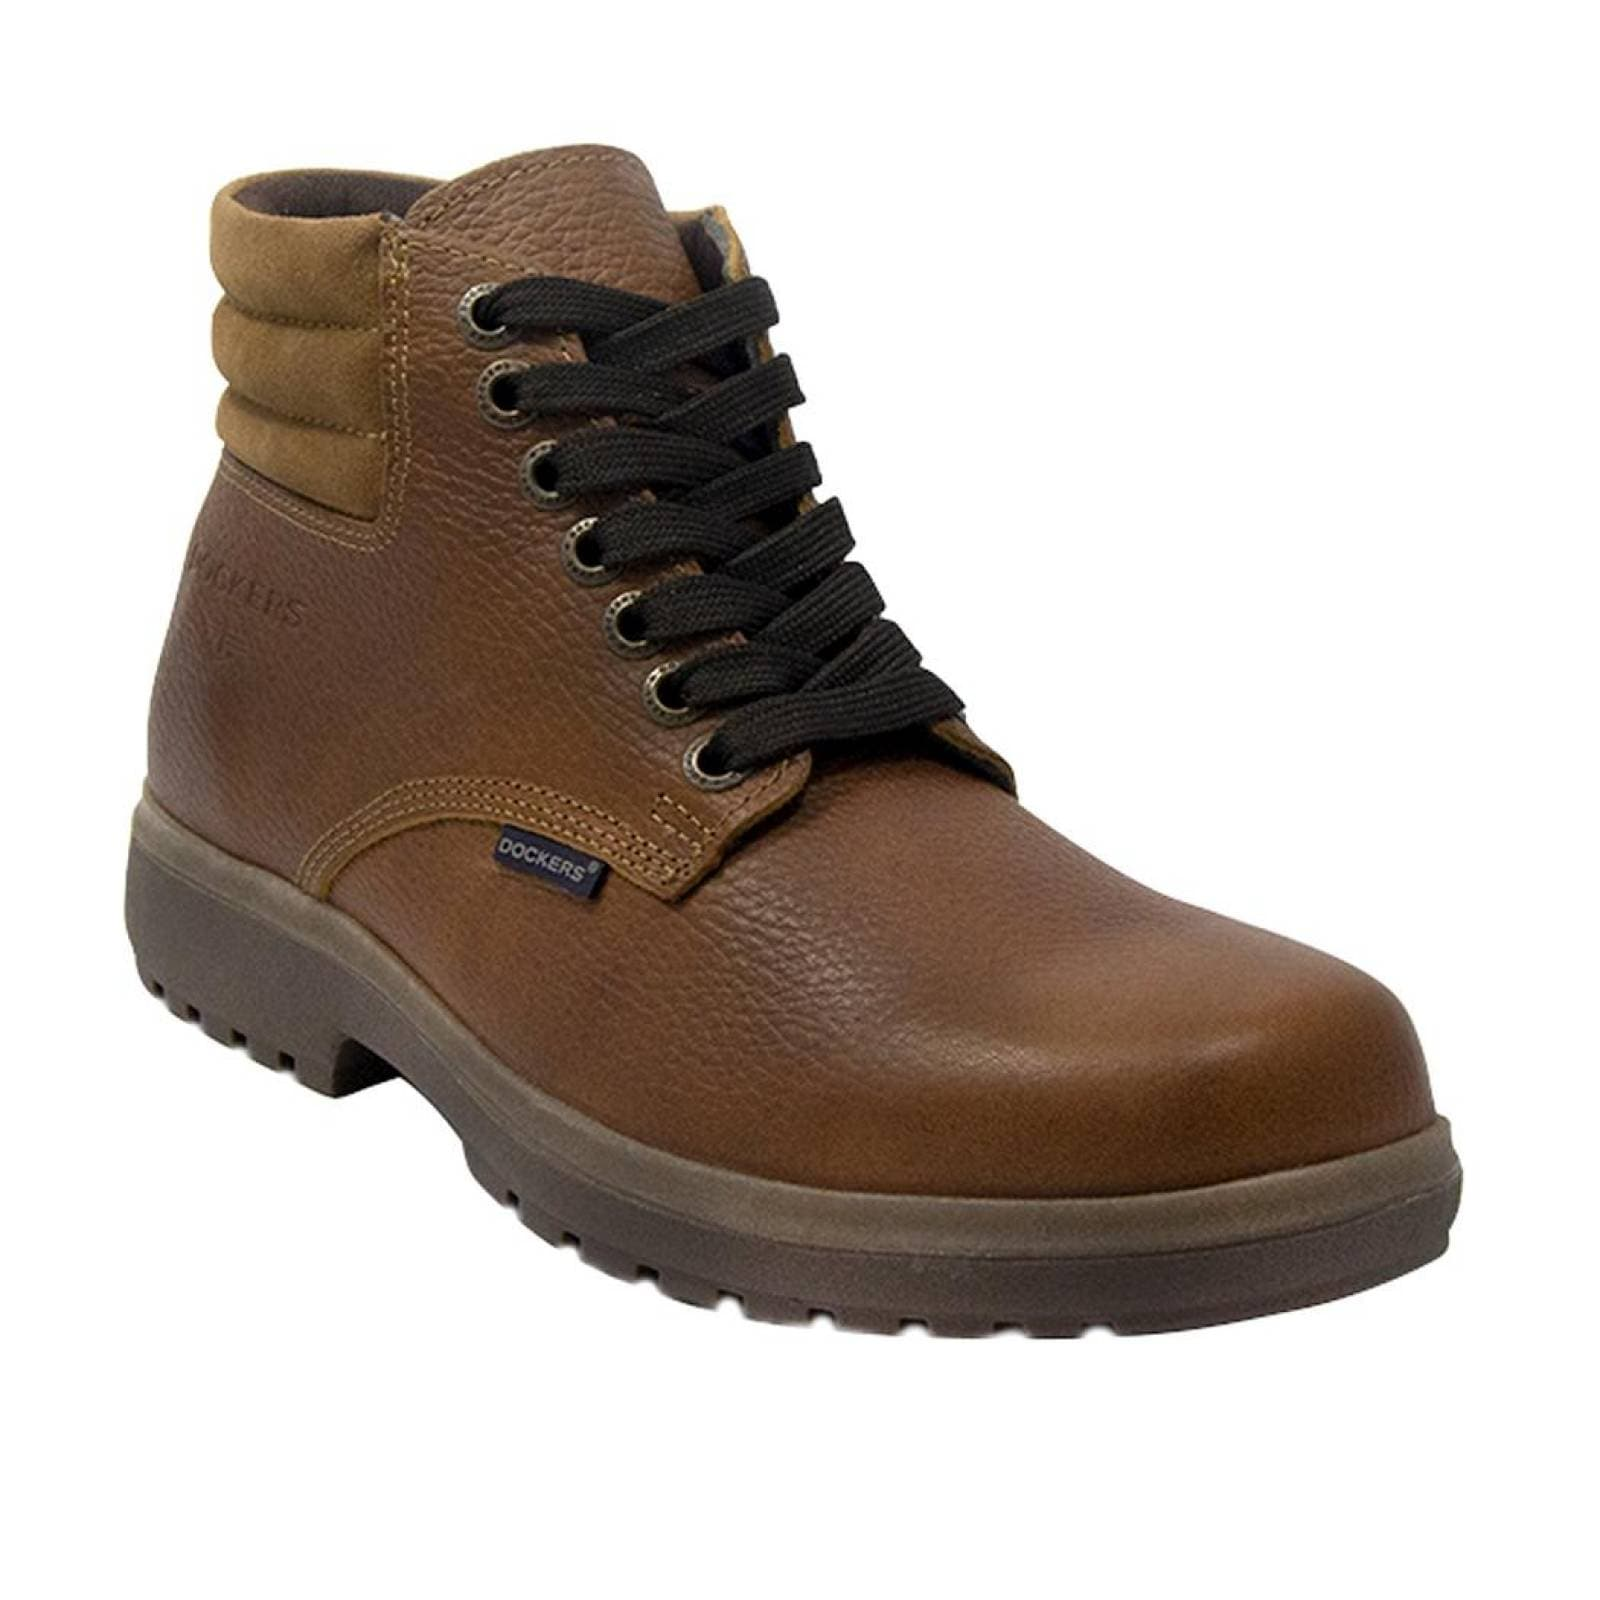 Dockers bota moda Casual Hombre color OCRE MORGAN 086C15